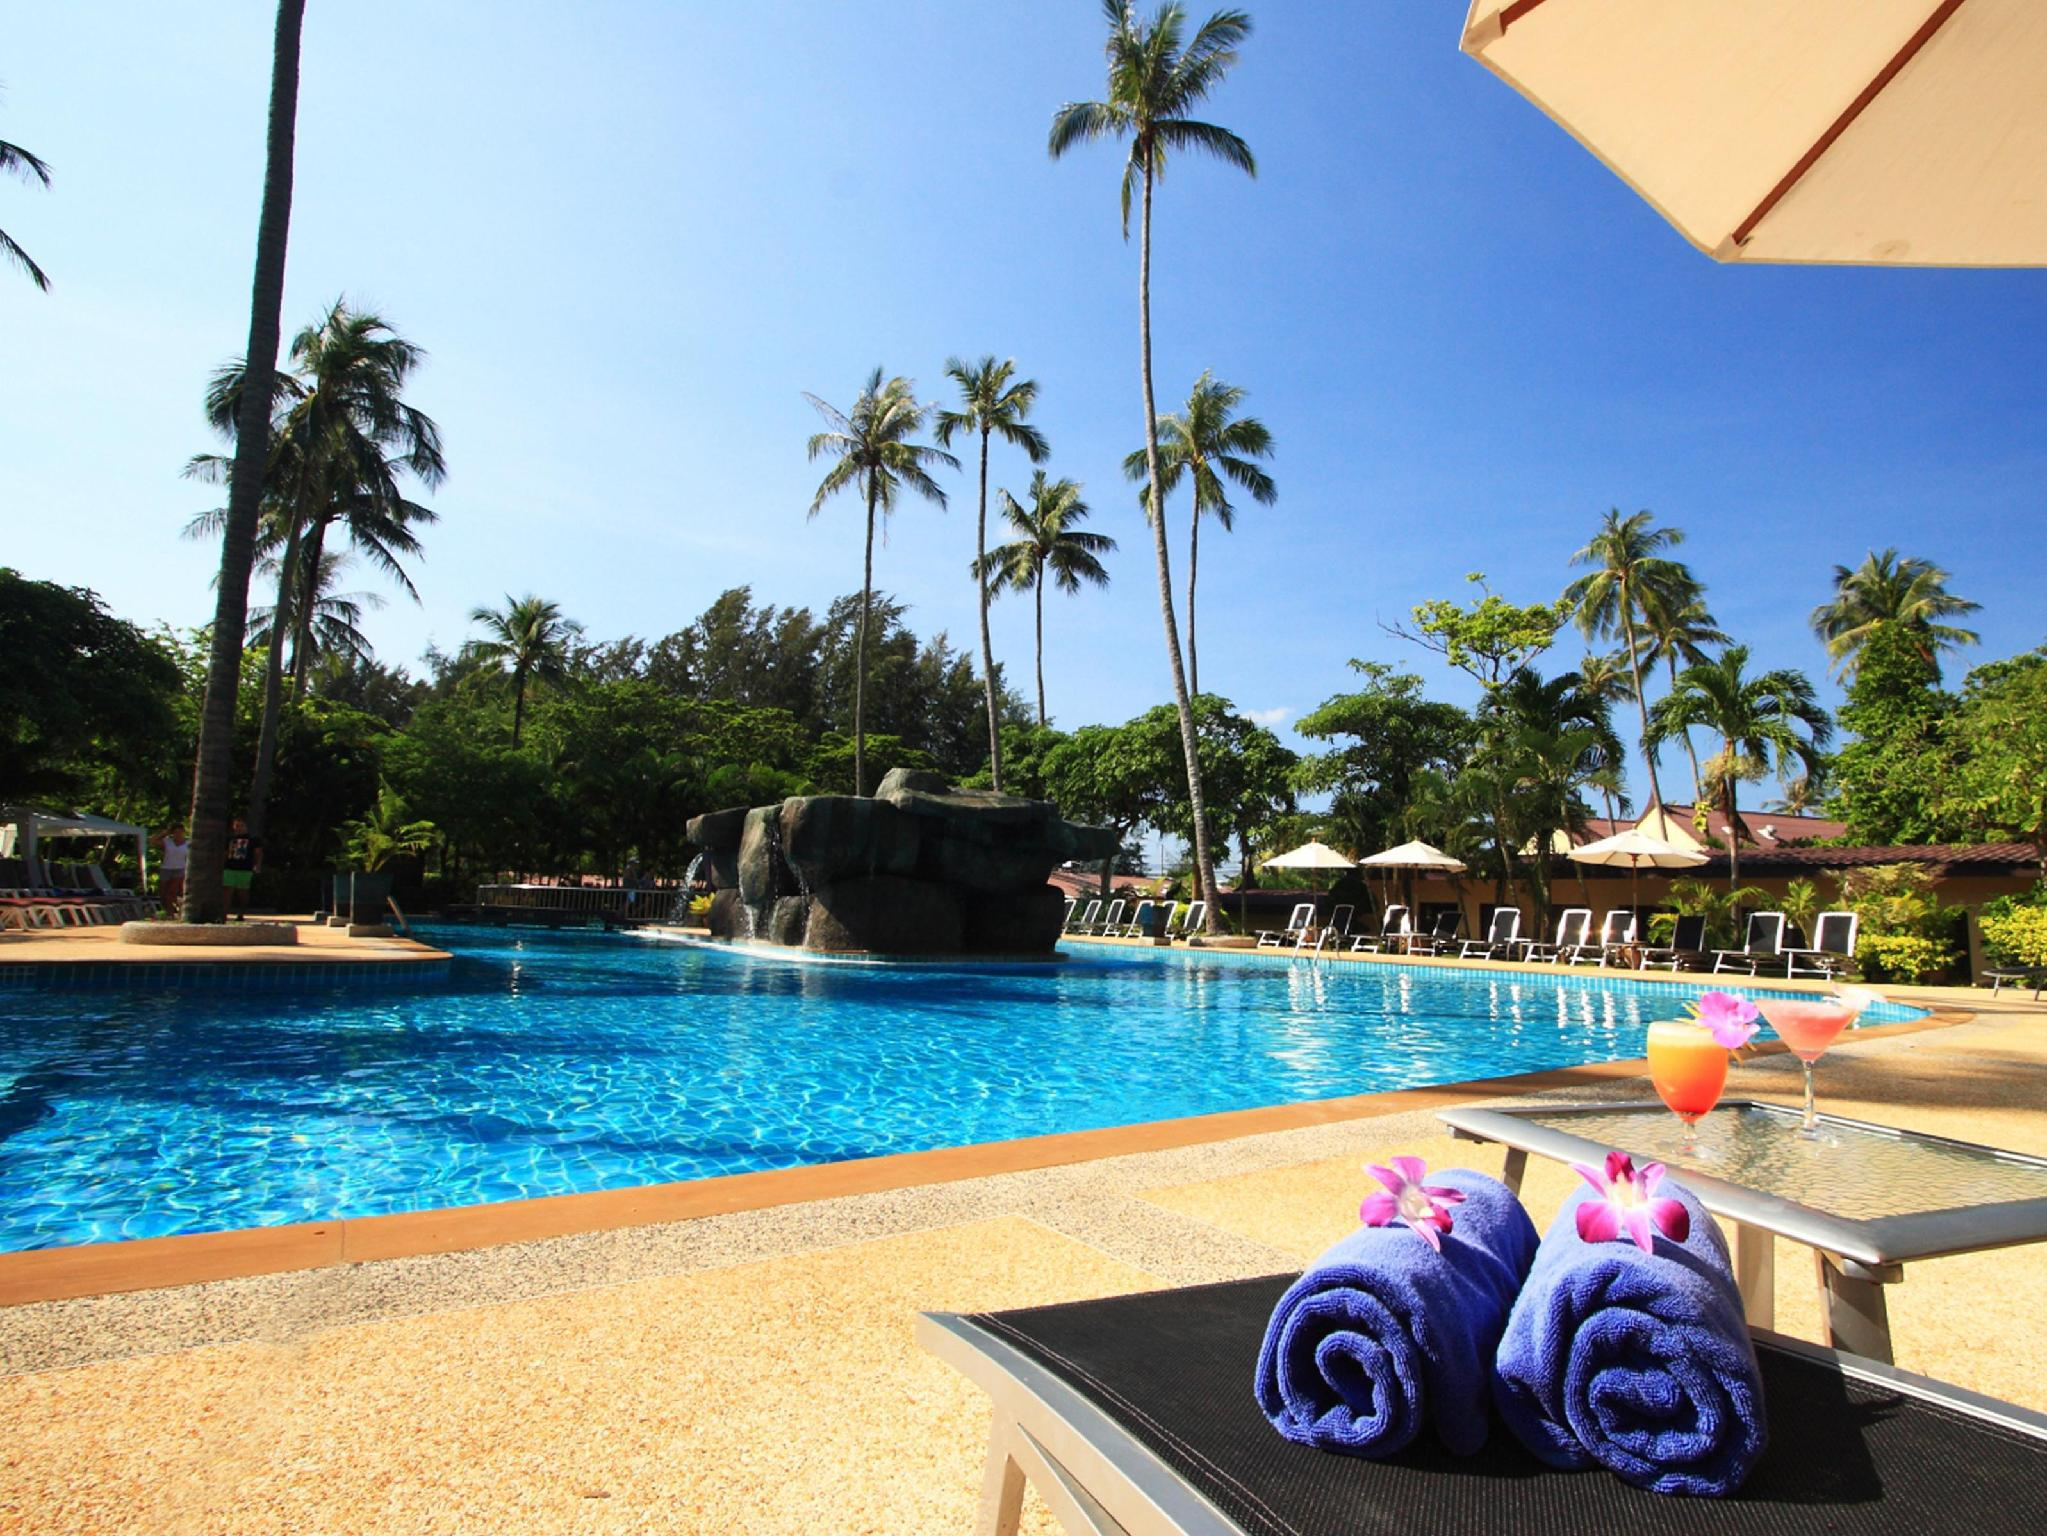 All Seasons Naiharn Phuket Hotel โรงแรม ออลซีซั่น ในหาน ภูเก็ต